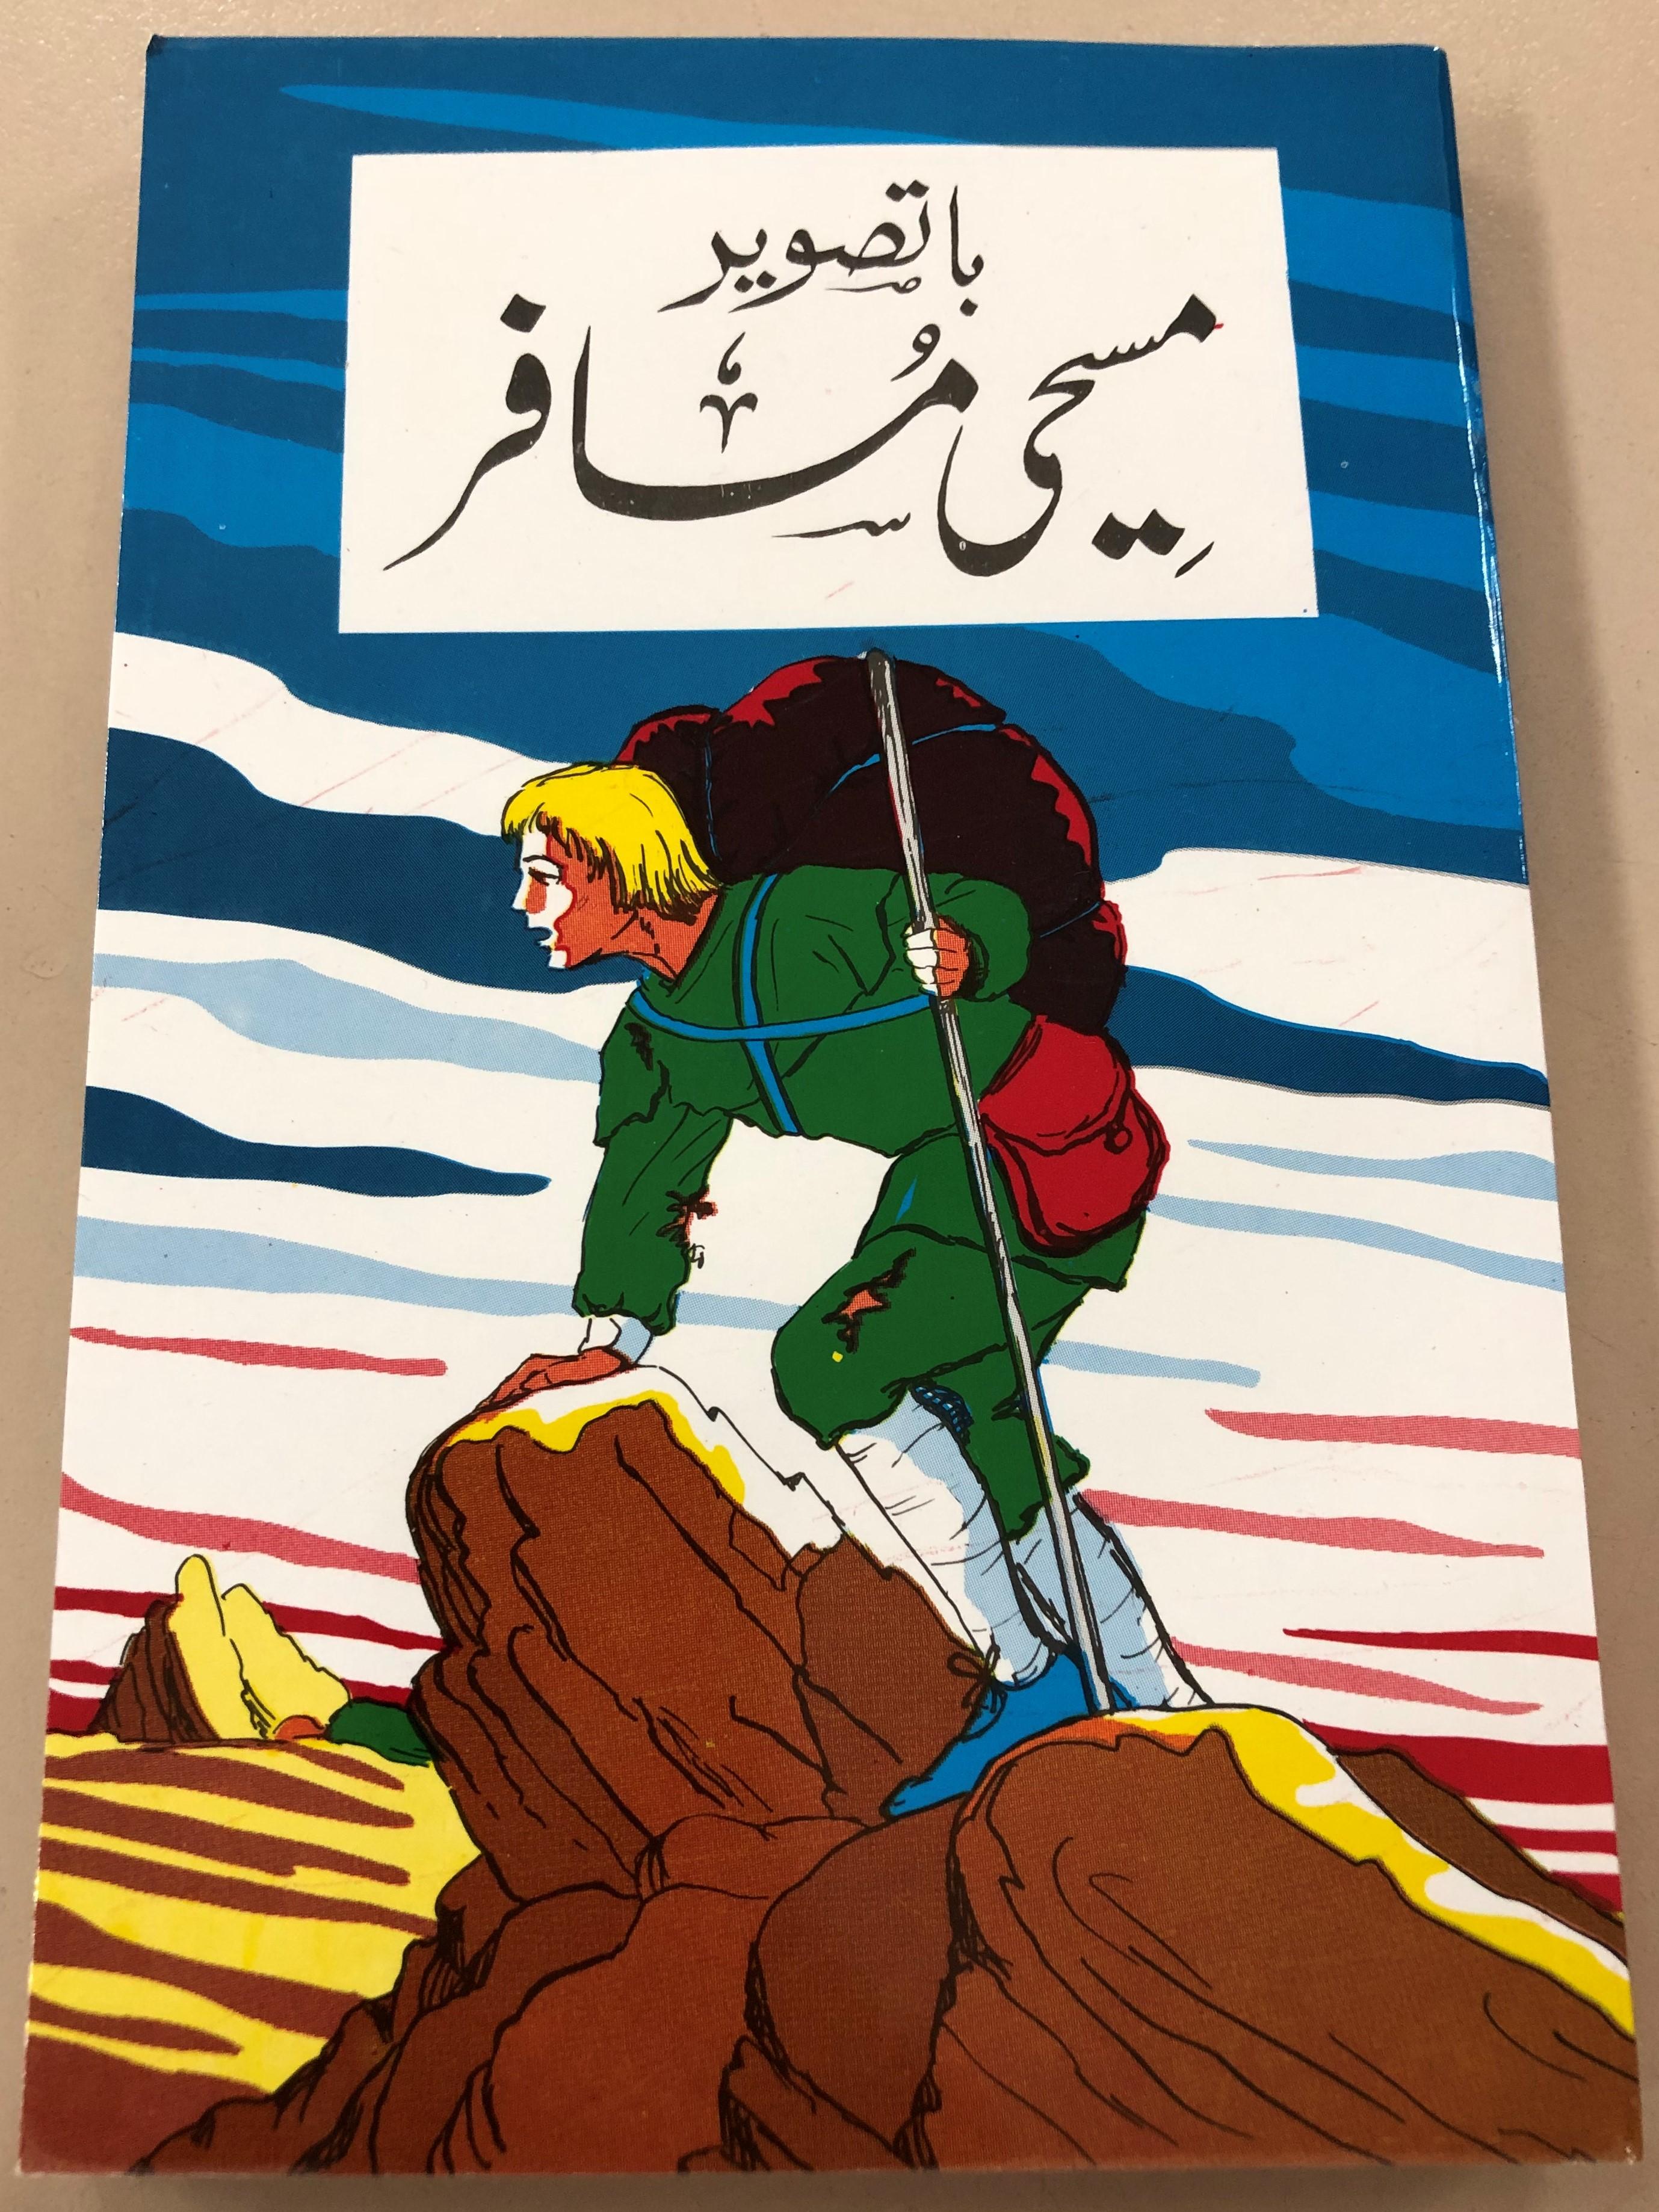 pictorial-pilgrim-s-progress-by-john-bunyan-in-urdu-language-hardcover-2019-masihi-isha-at-khana-1-.jpg